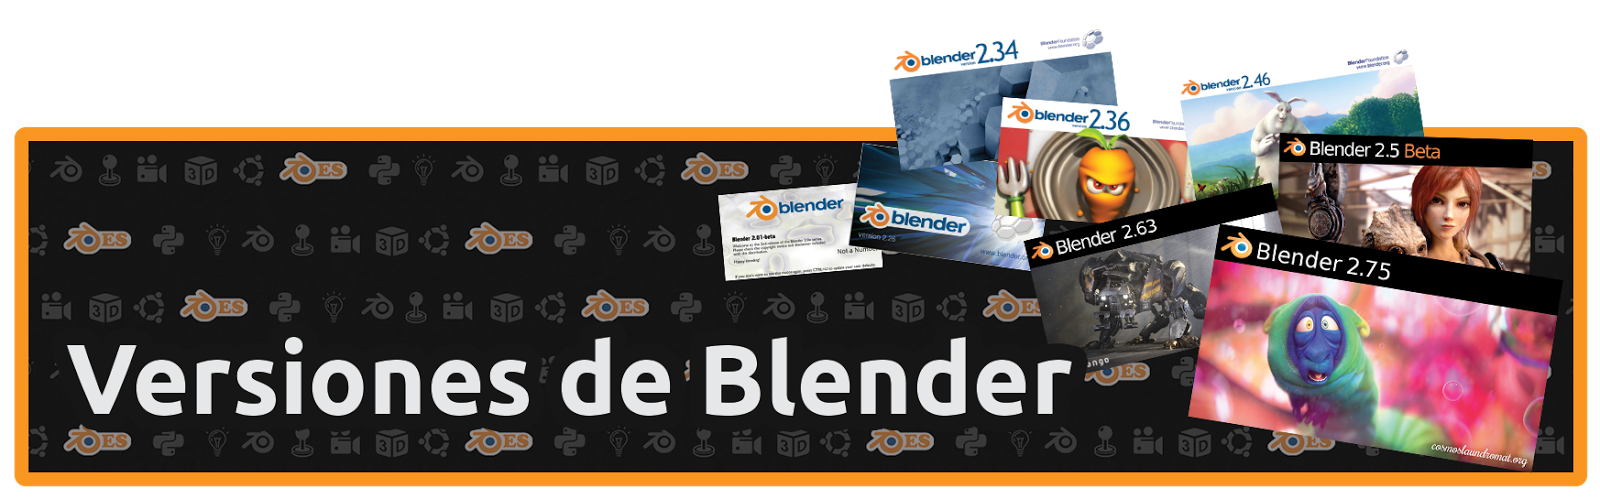 Boton_Versiones-de-Blender